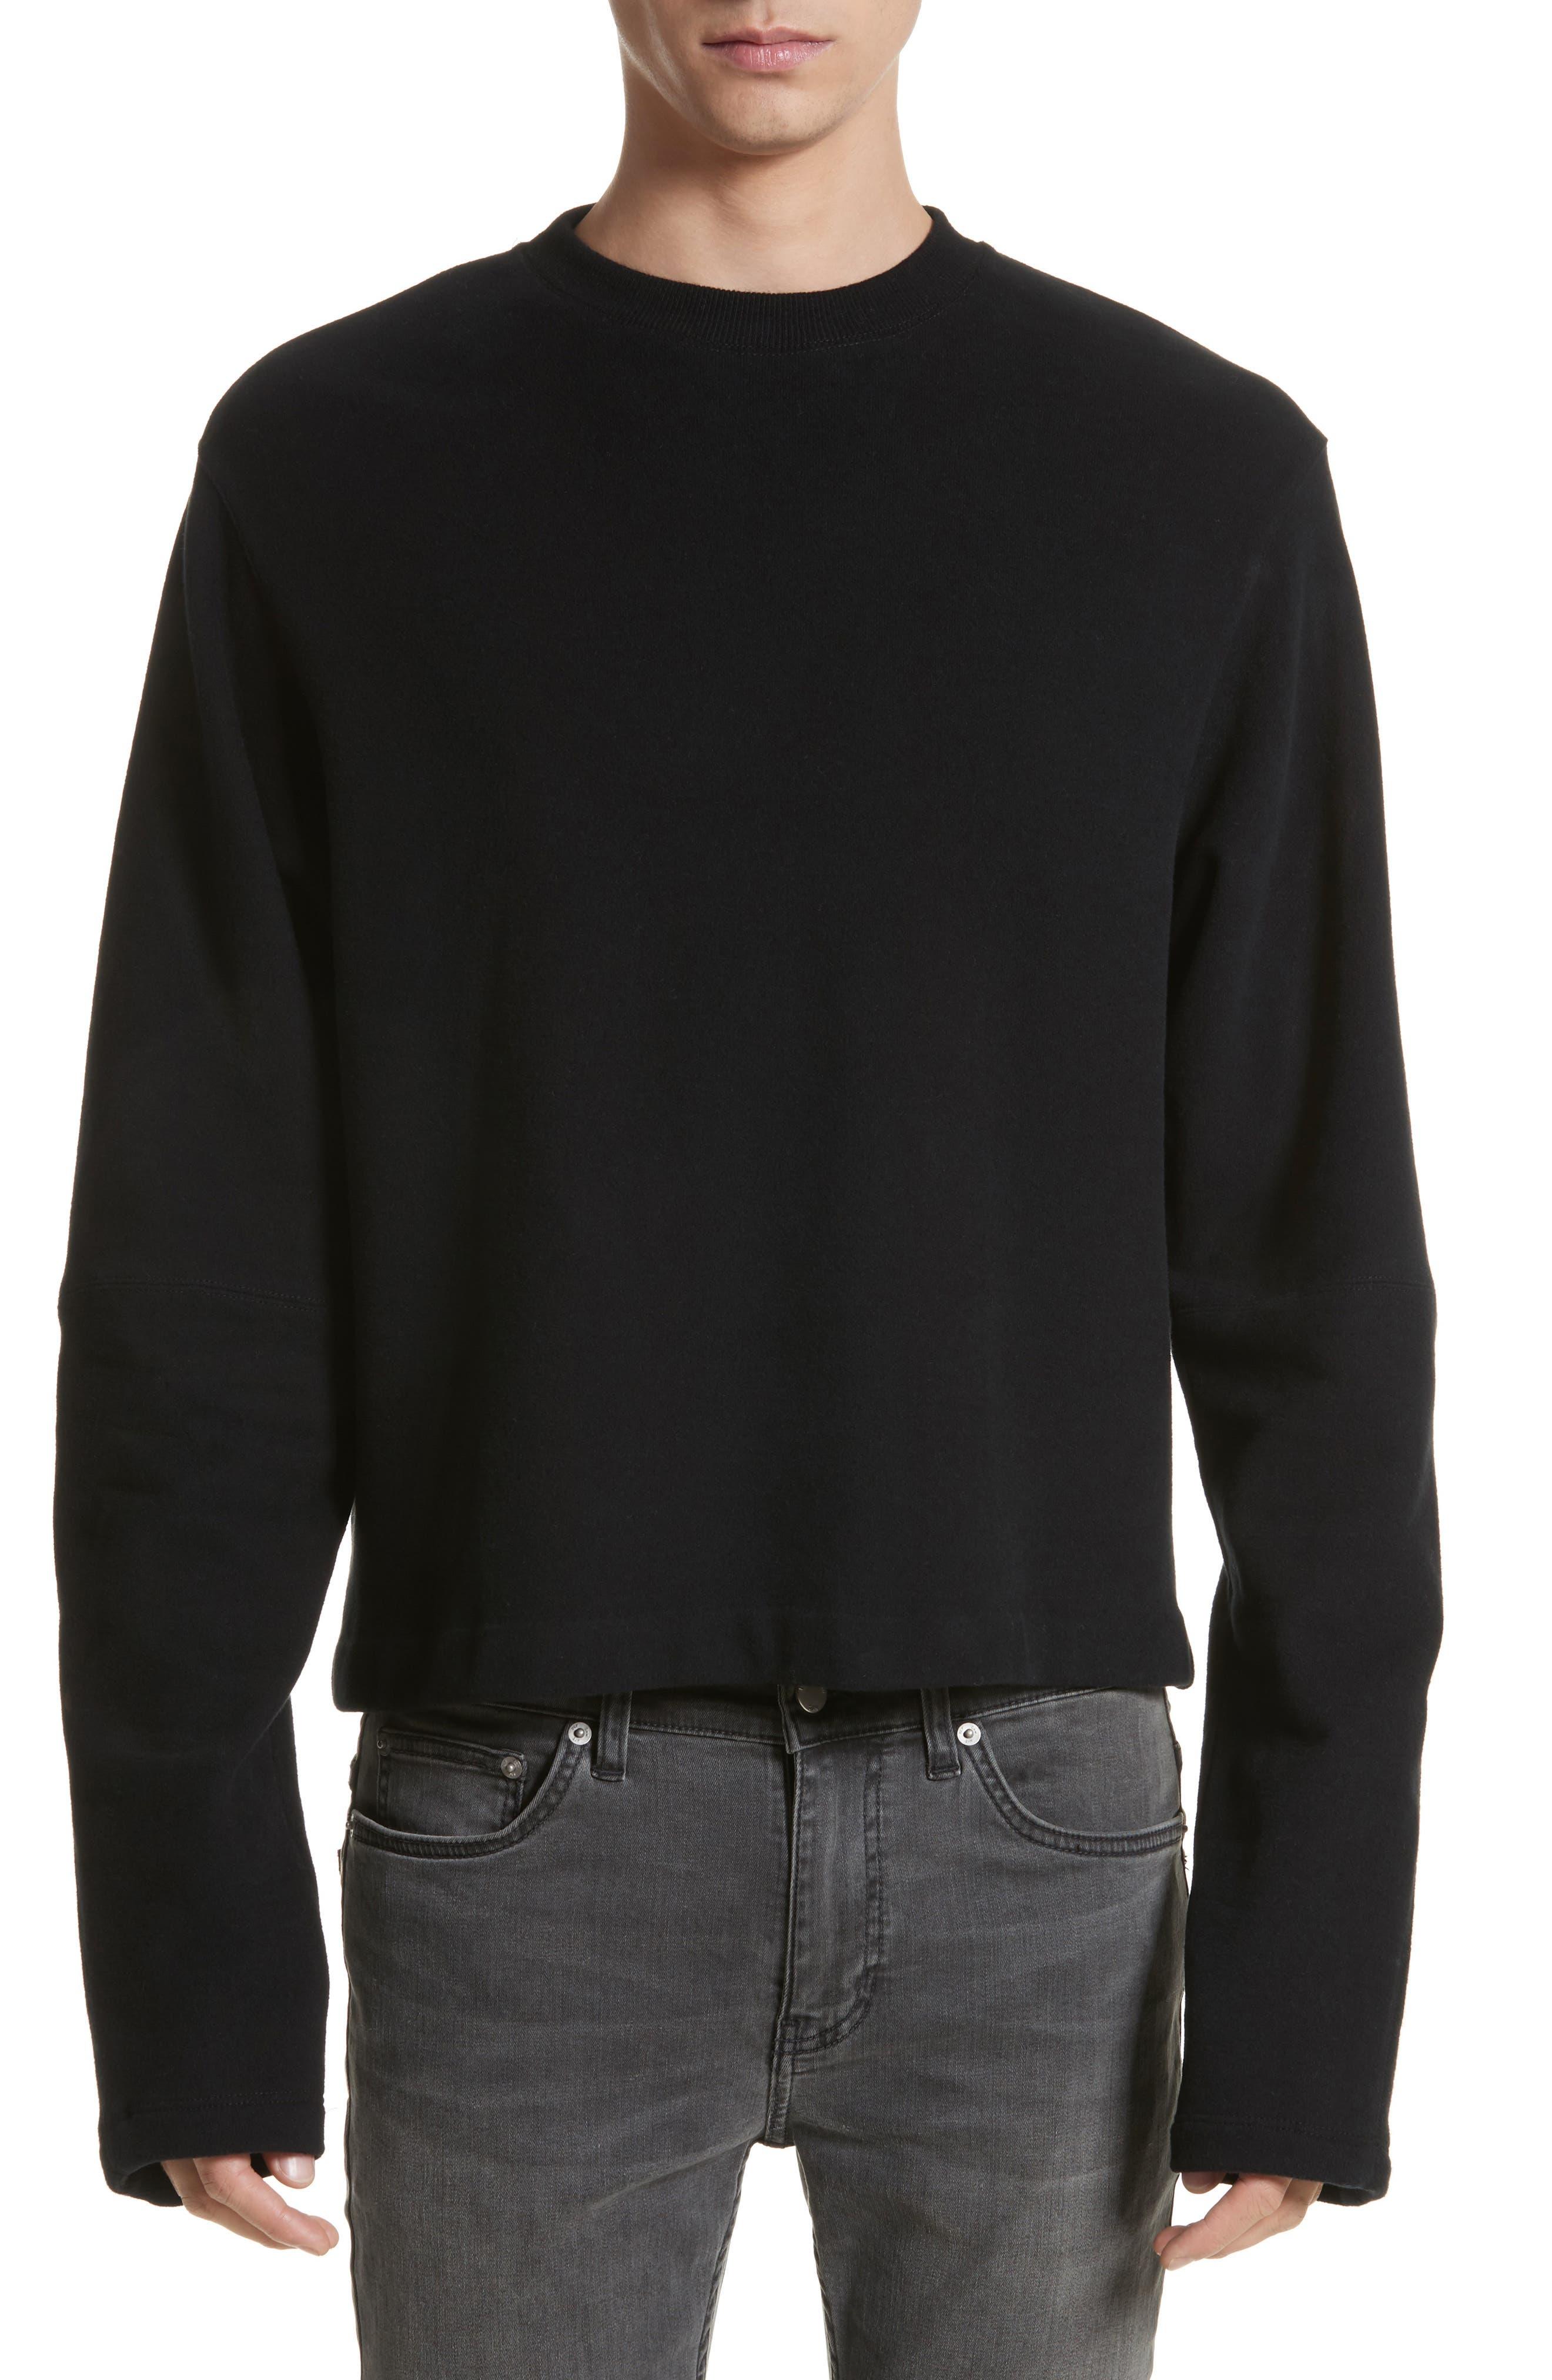 Alternate Image 1 Selected - Helmut Lang Rib Detail Crewneck Sweater